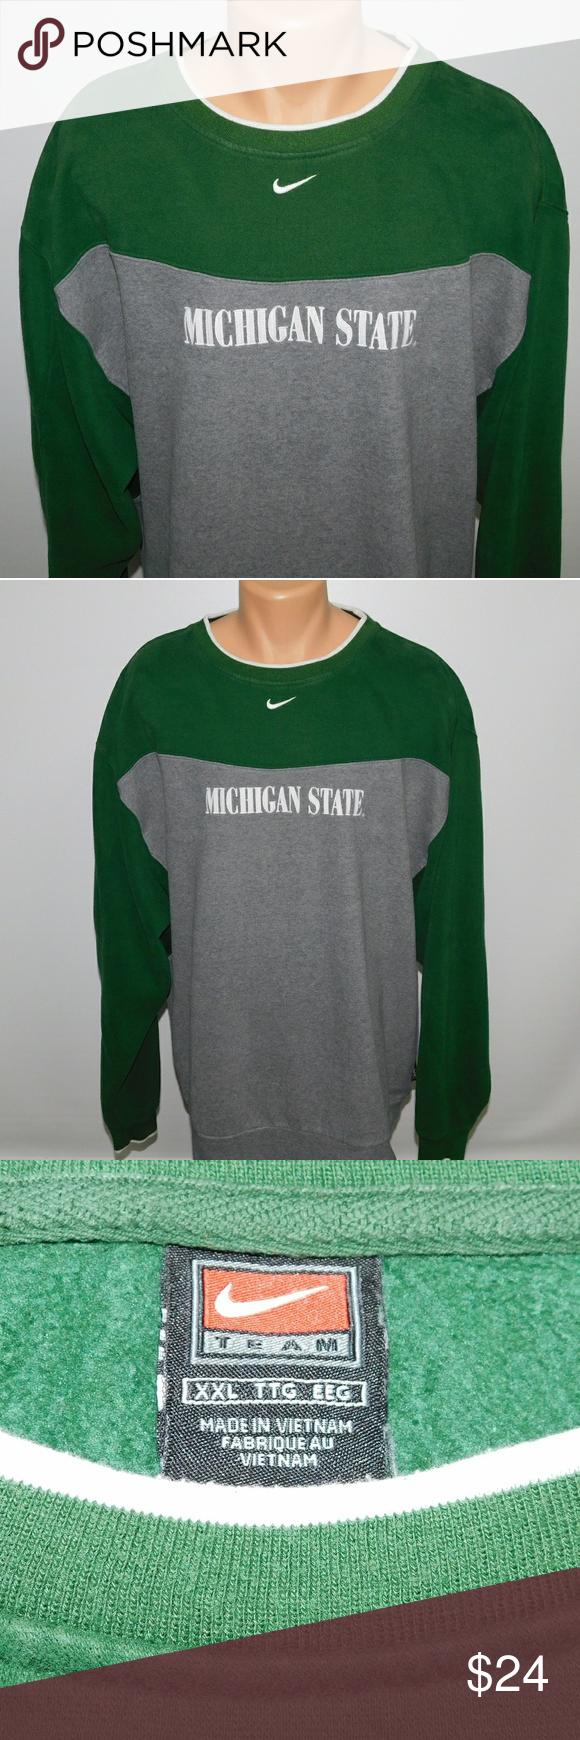 Nike Michigan State Crew Neck Sweatshirt Xxl Sweatshirts Crew Neck Sweatshirt Sweatshirt Shirt [ 1740 x 580 Pixel ]